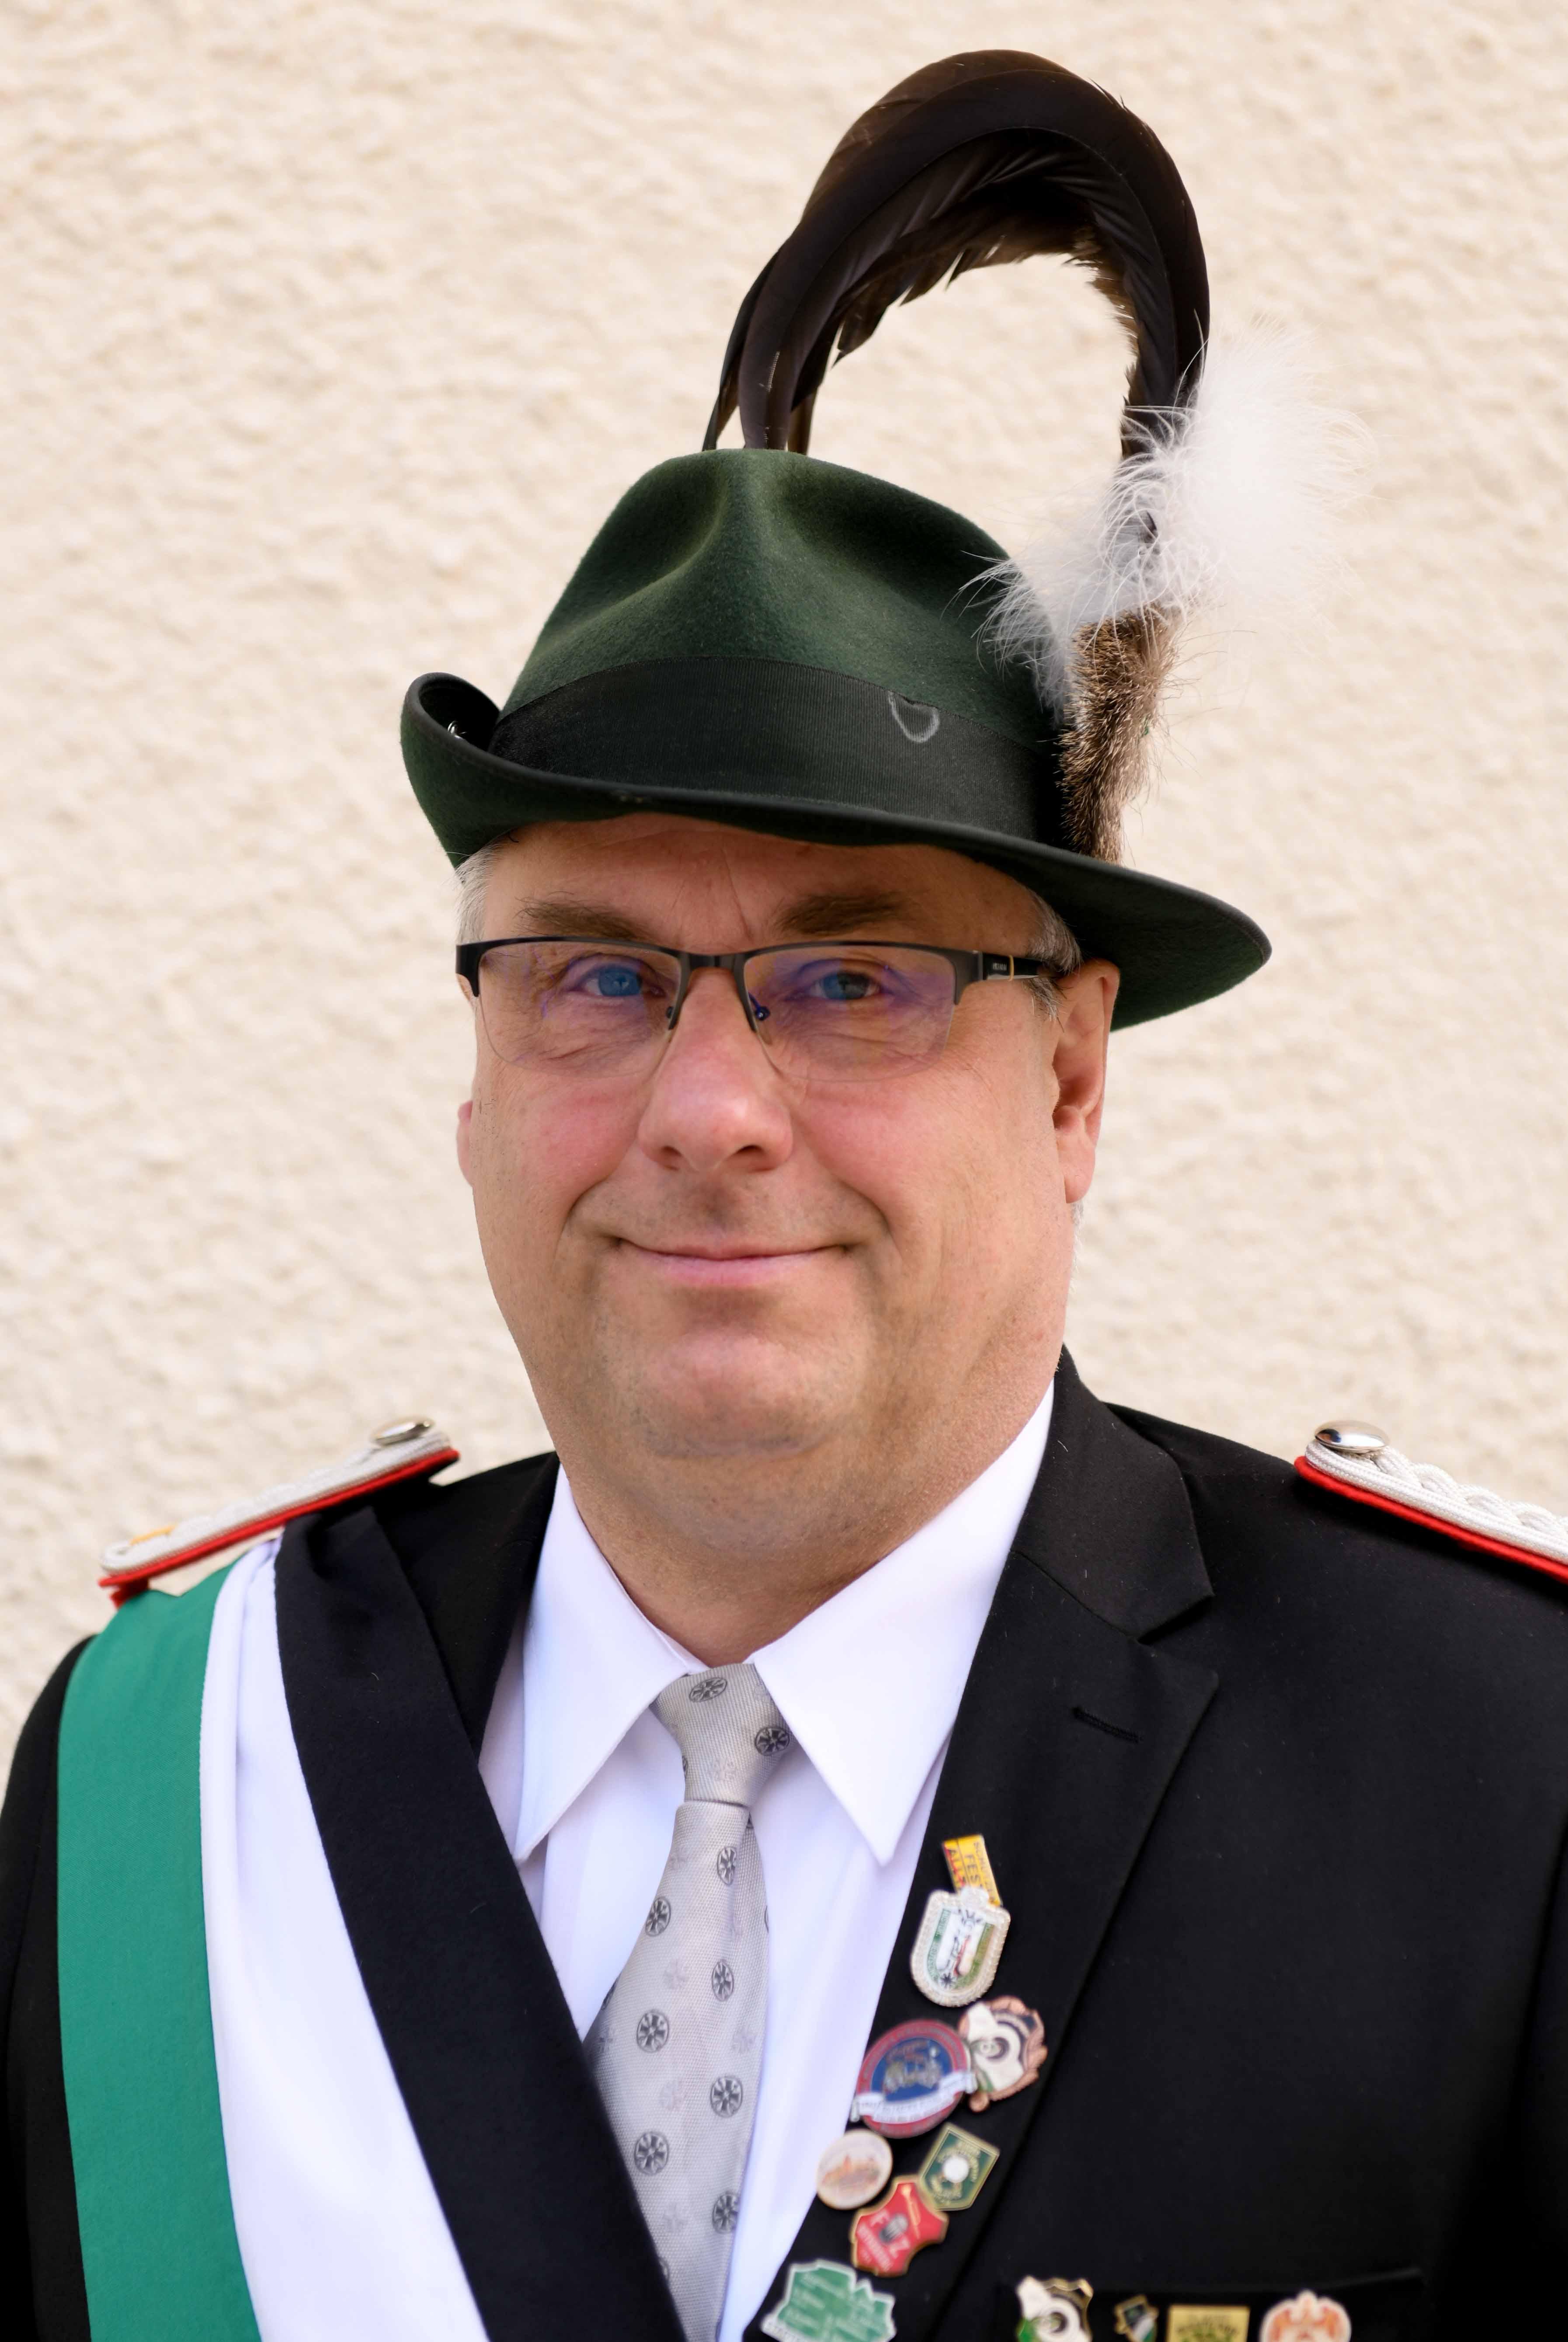 Andreas Geveler